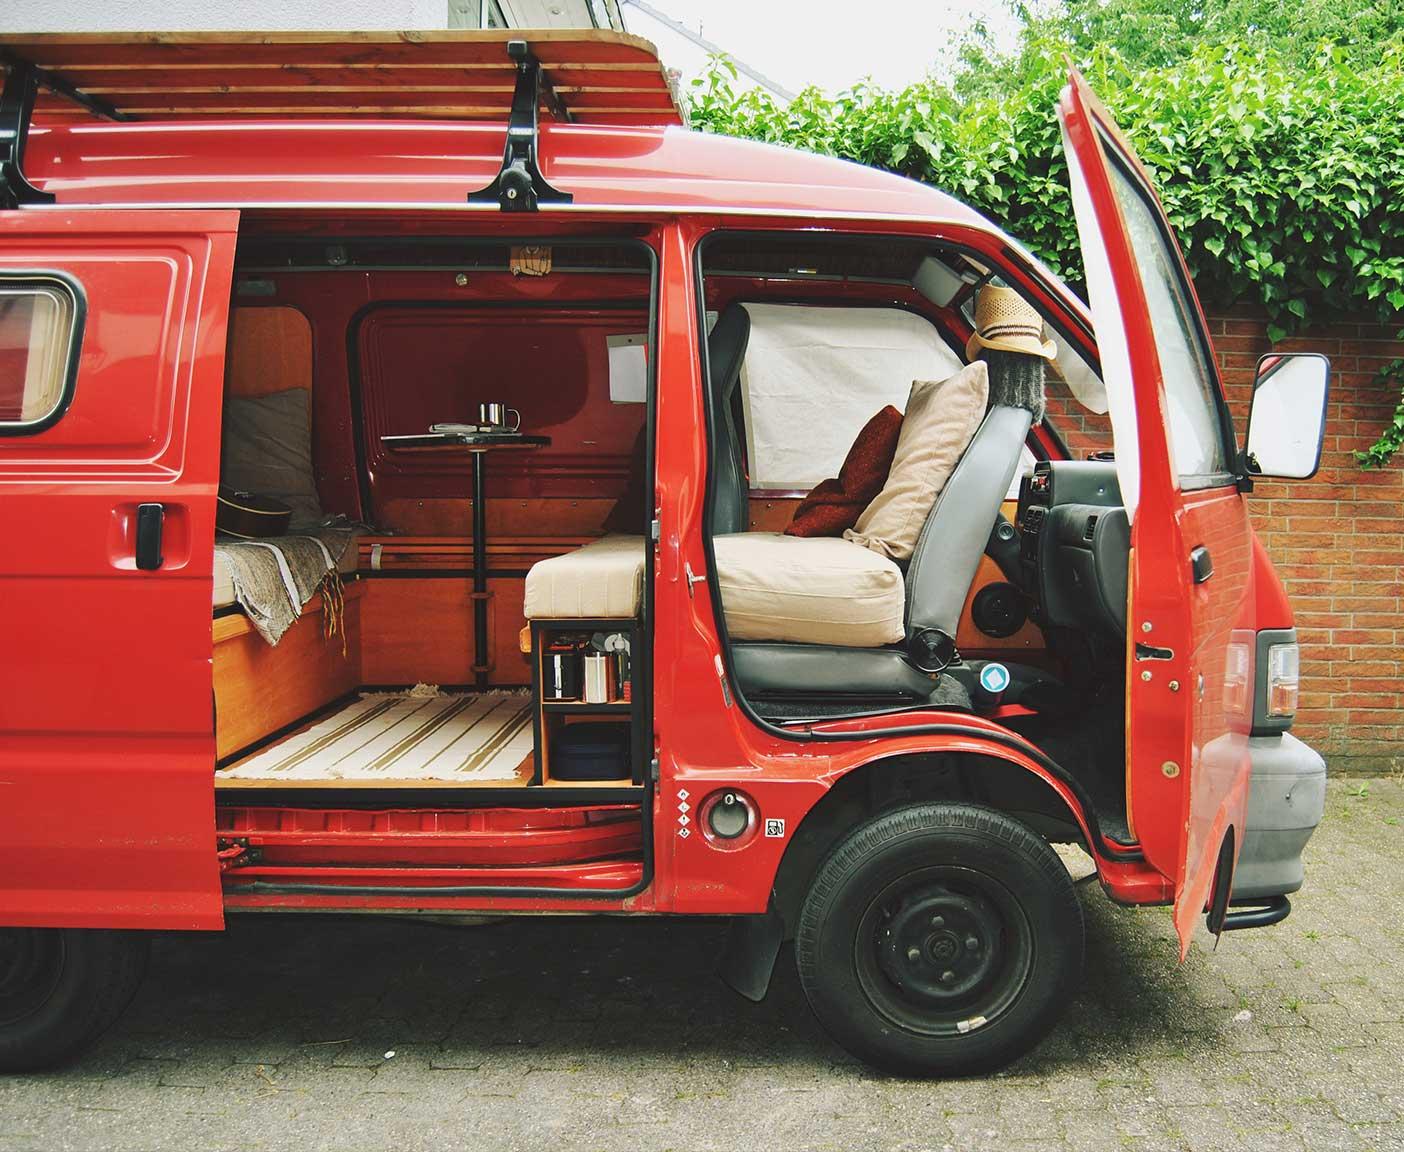 daihatsu-hijet-S85-wohnmobil-vanlife-selbstausbau-wohnmobil-ausbau-diy-camper-3